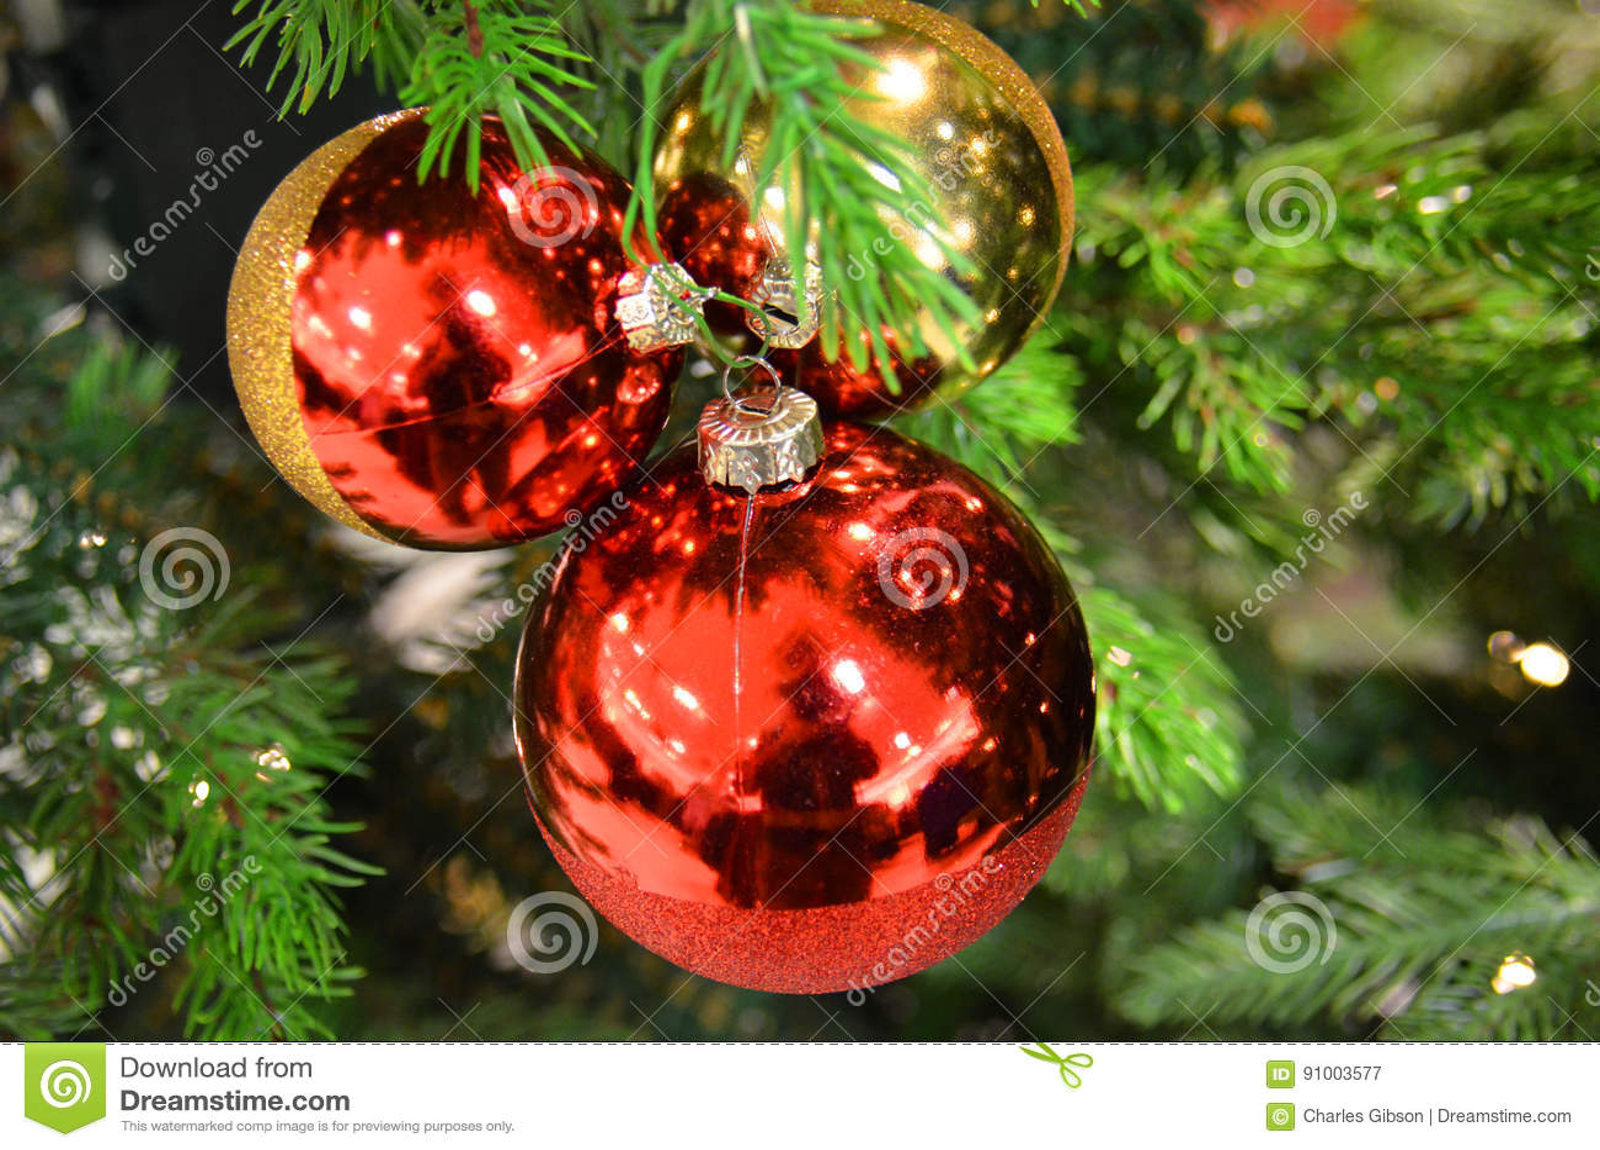 England Christmas Decorations.Christmas Decorations Stock Image Image Of London England